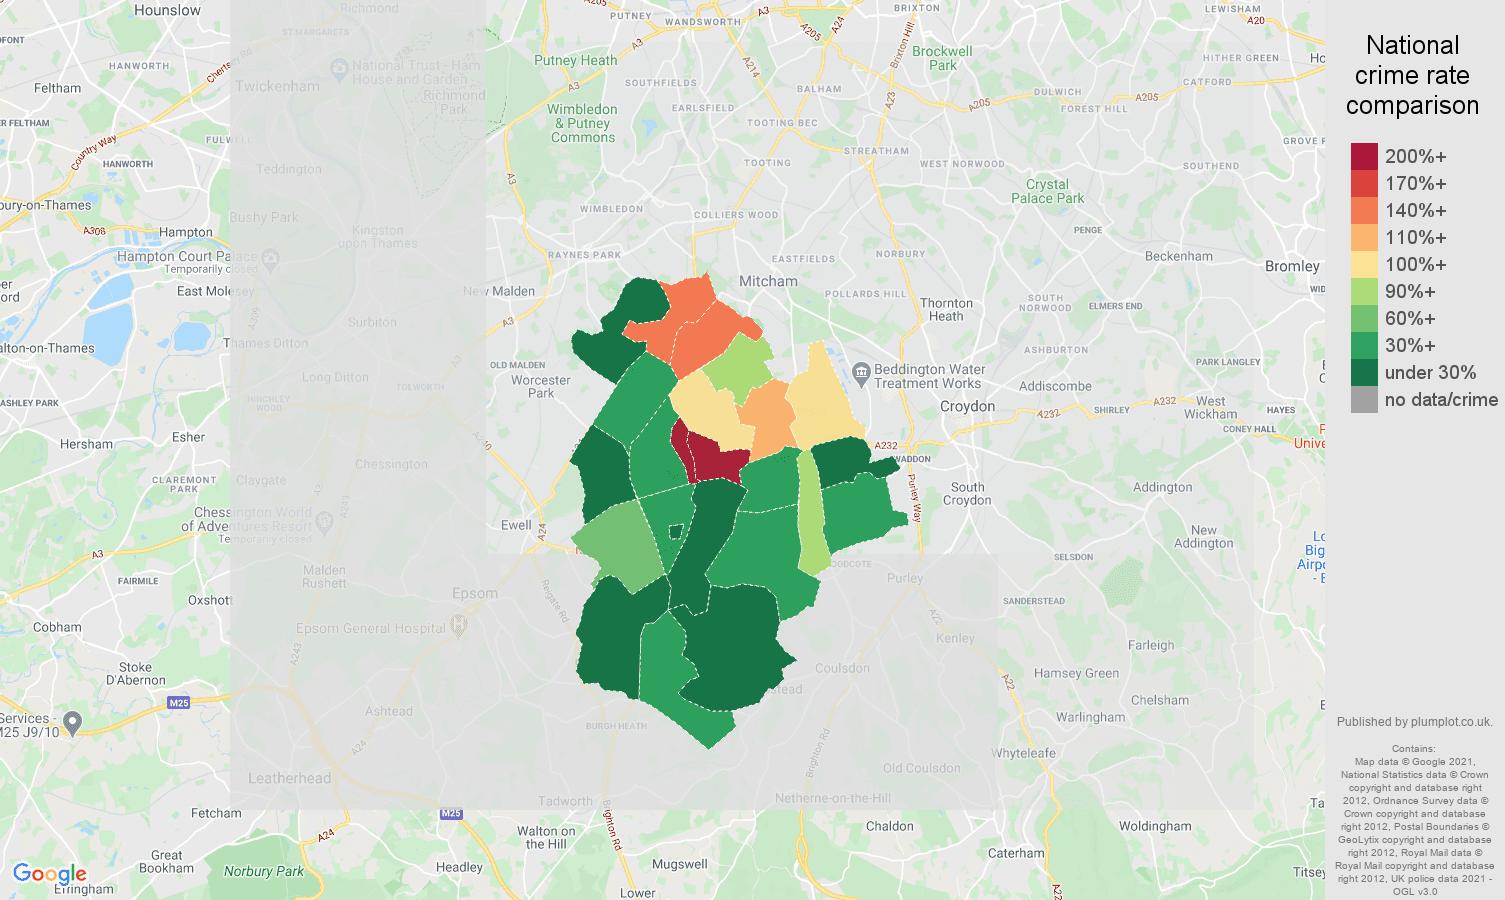 Sutton bicycle theft crime rate comparison map